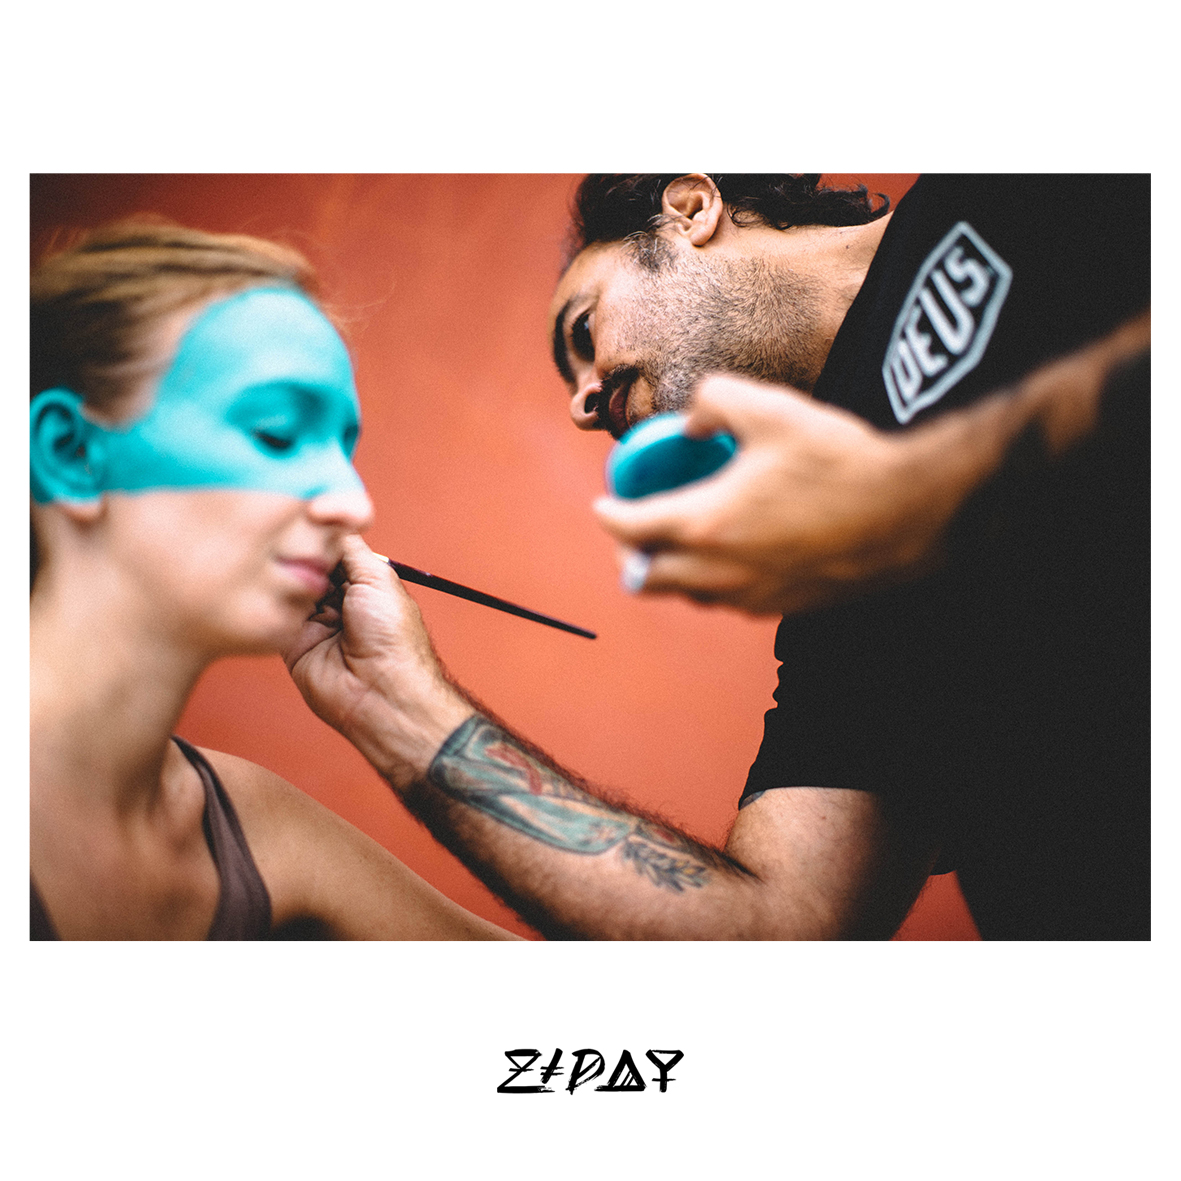 Body Painting. Ziday